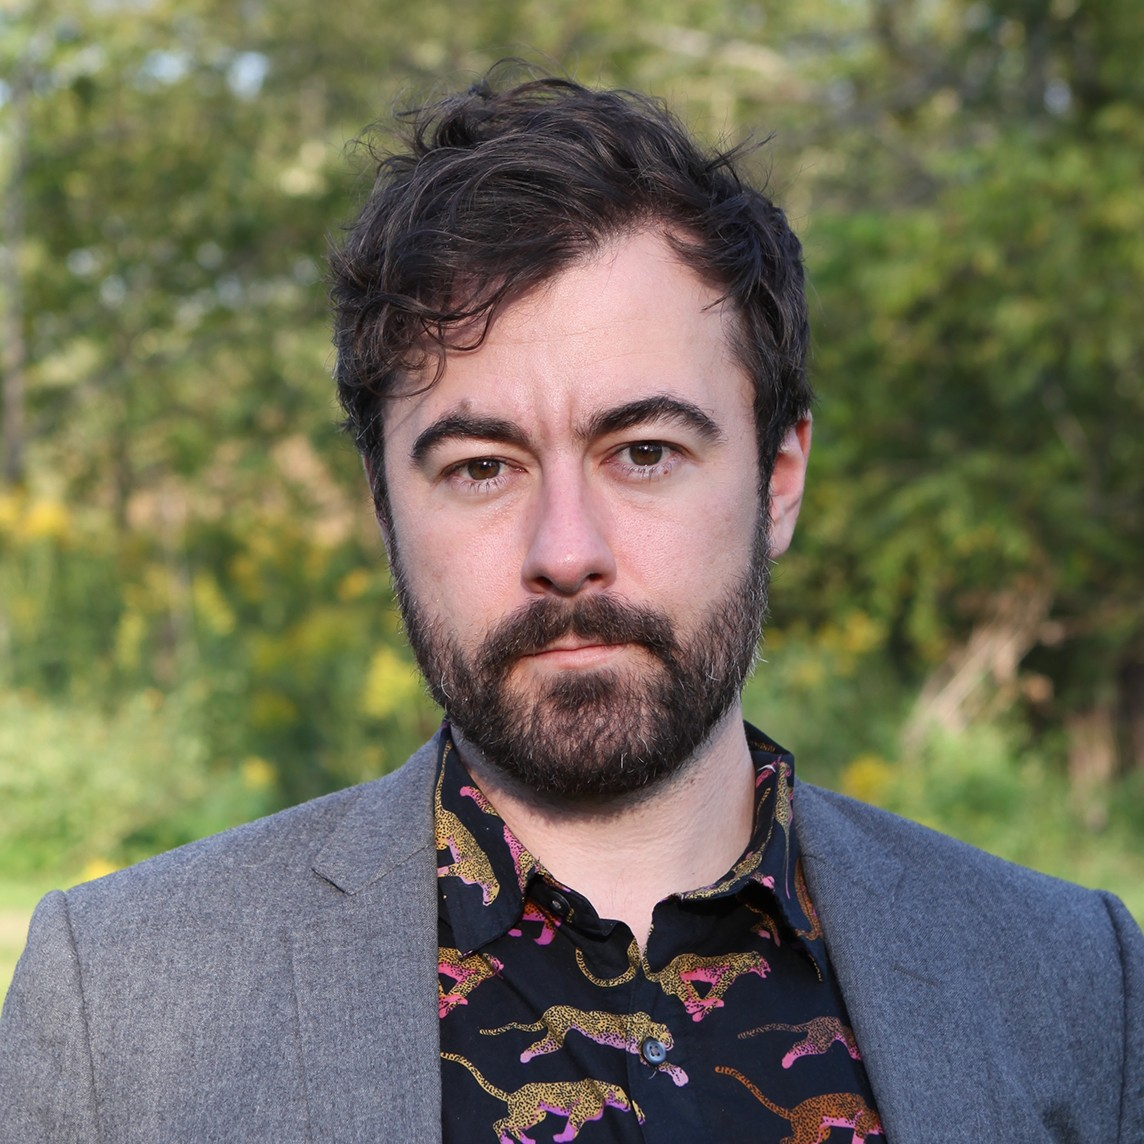 headshot of art history professor wearing patterned black shirt and gray jacket